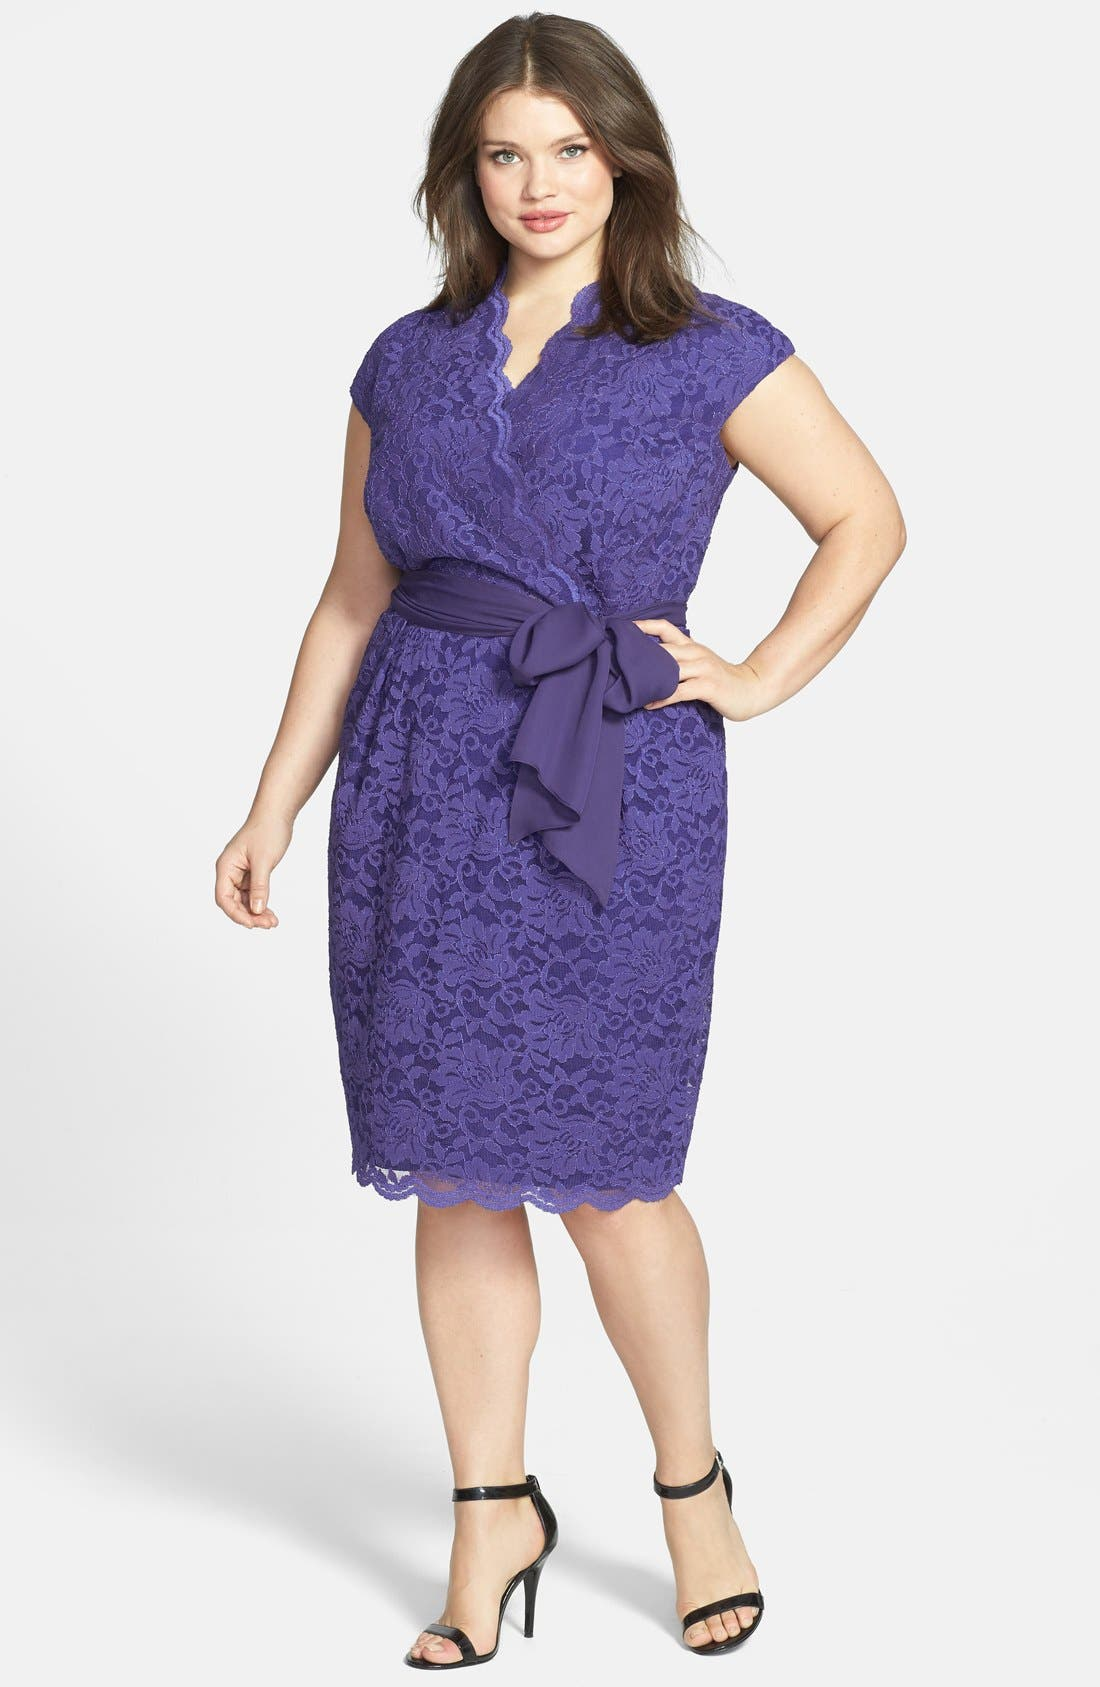 Alternate Image 1 Selected - Alex Evenings Surplice Neckline Lace Dress (Plus Size)